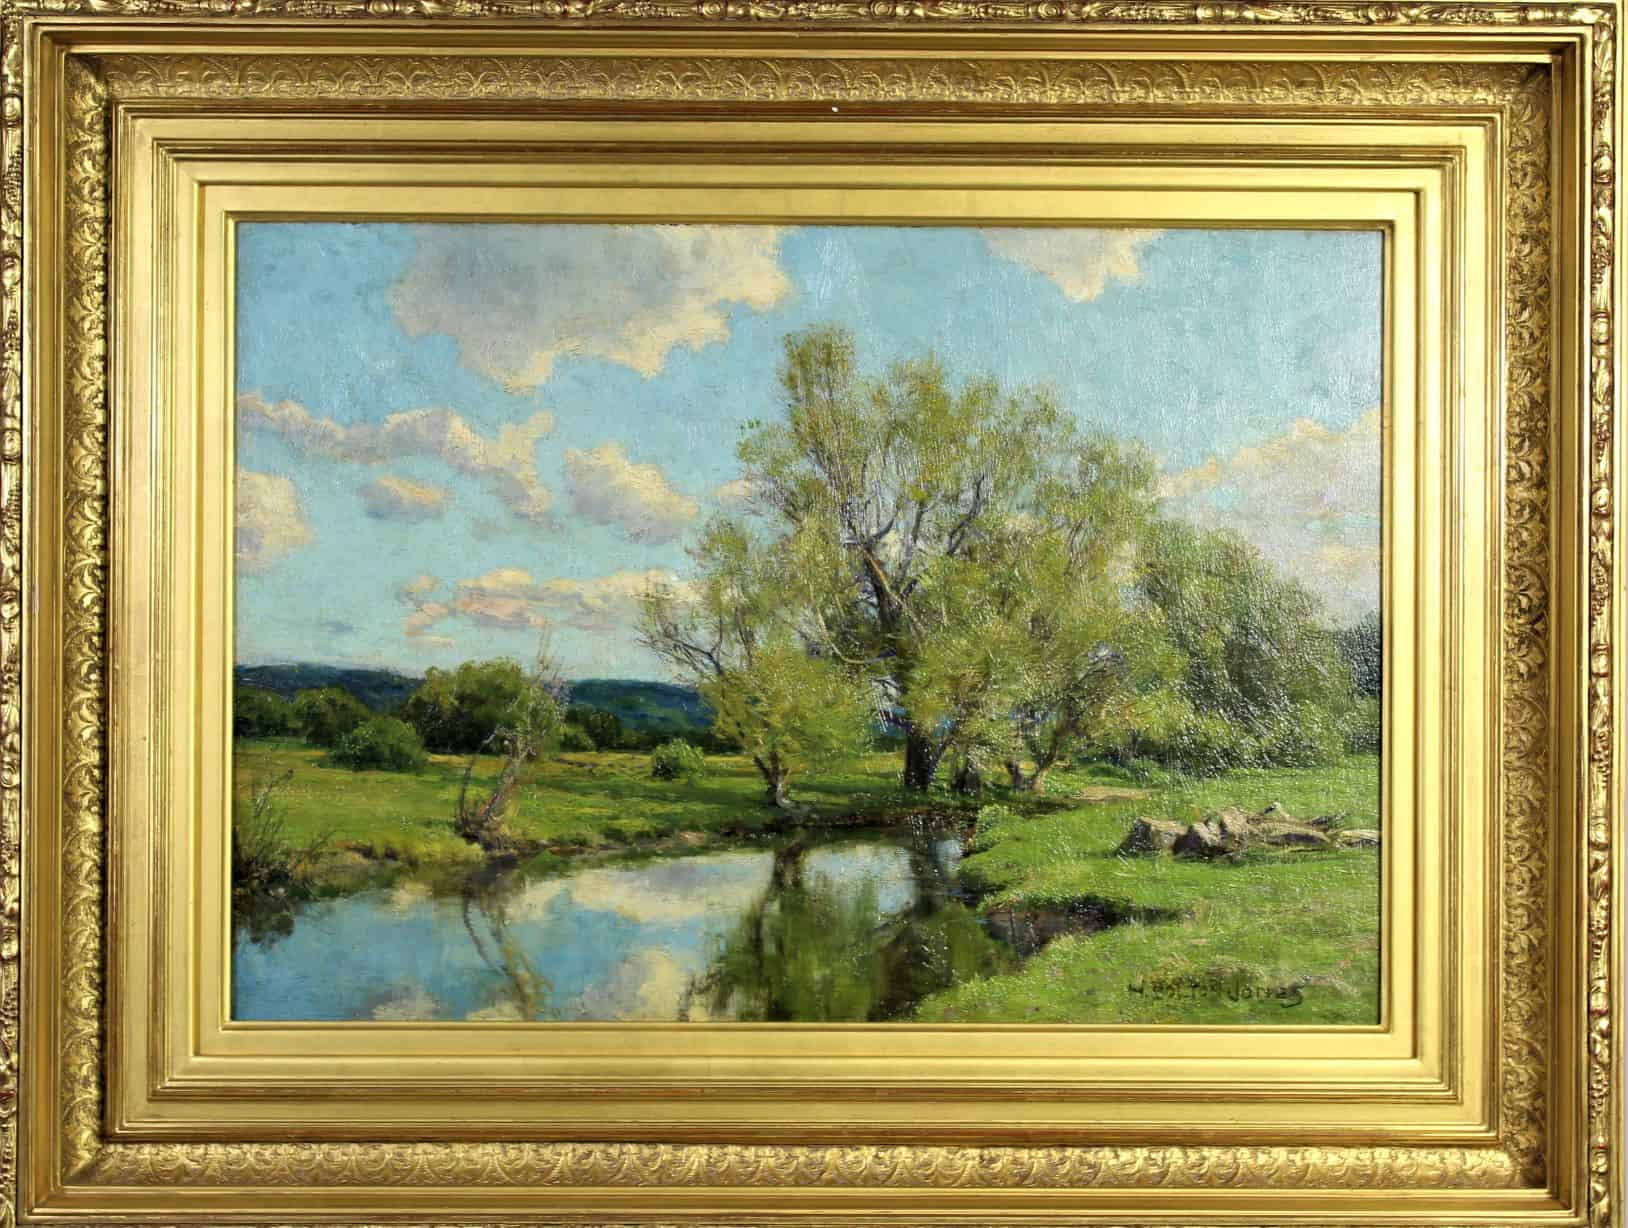 Hugh Bolton Jones (1848-1927) Oil on Canvas